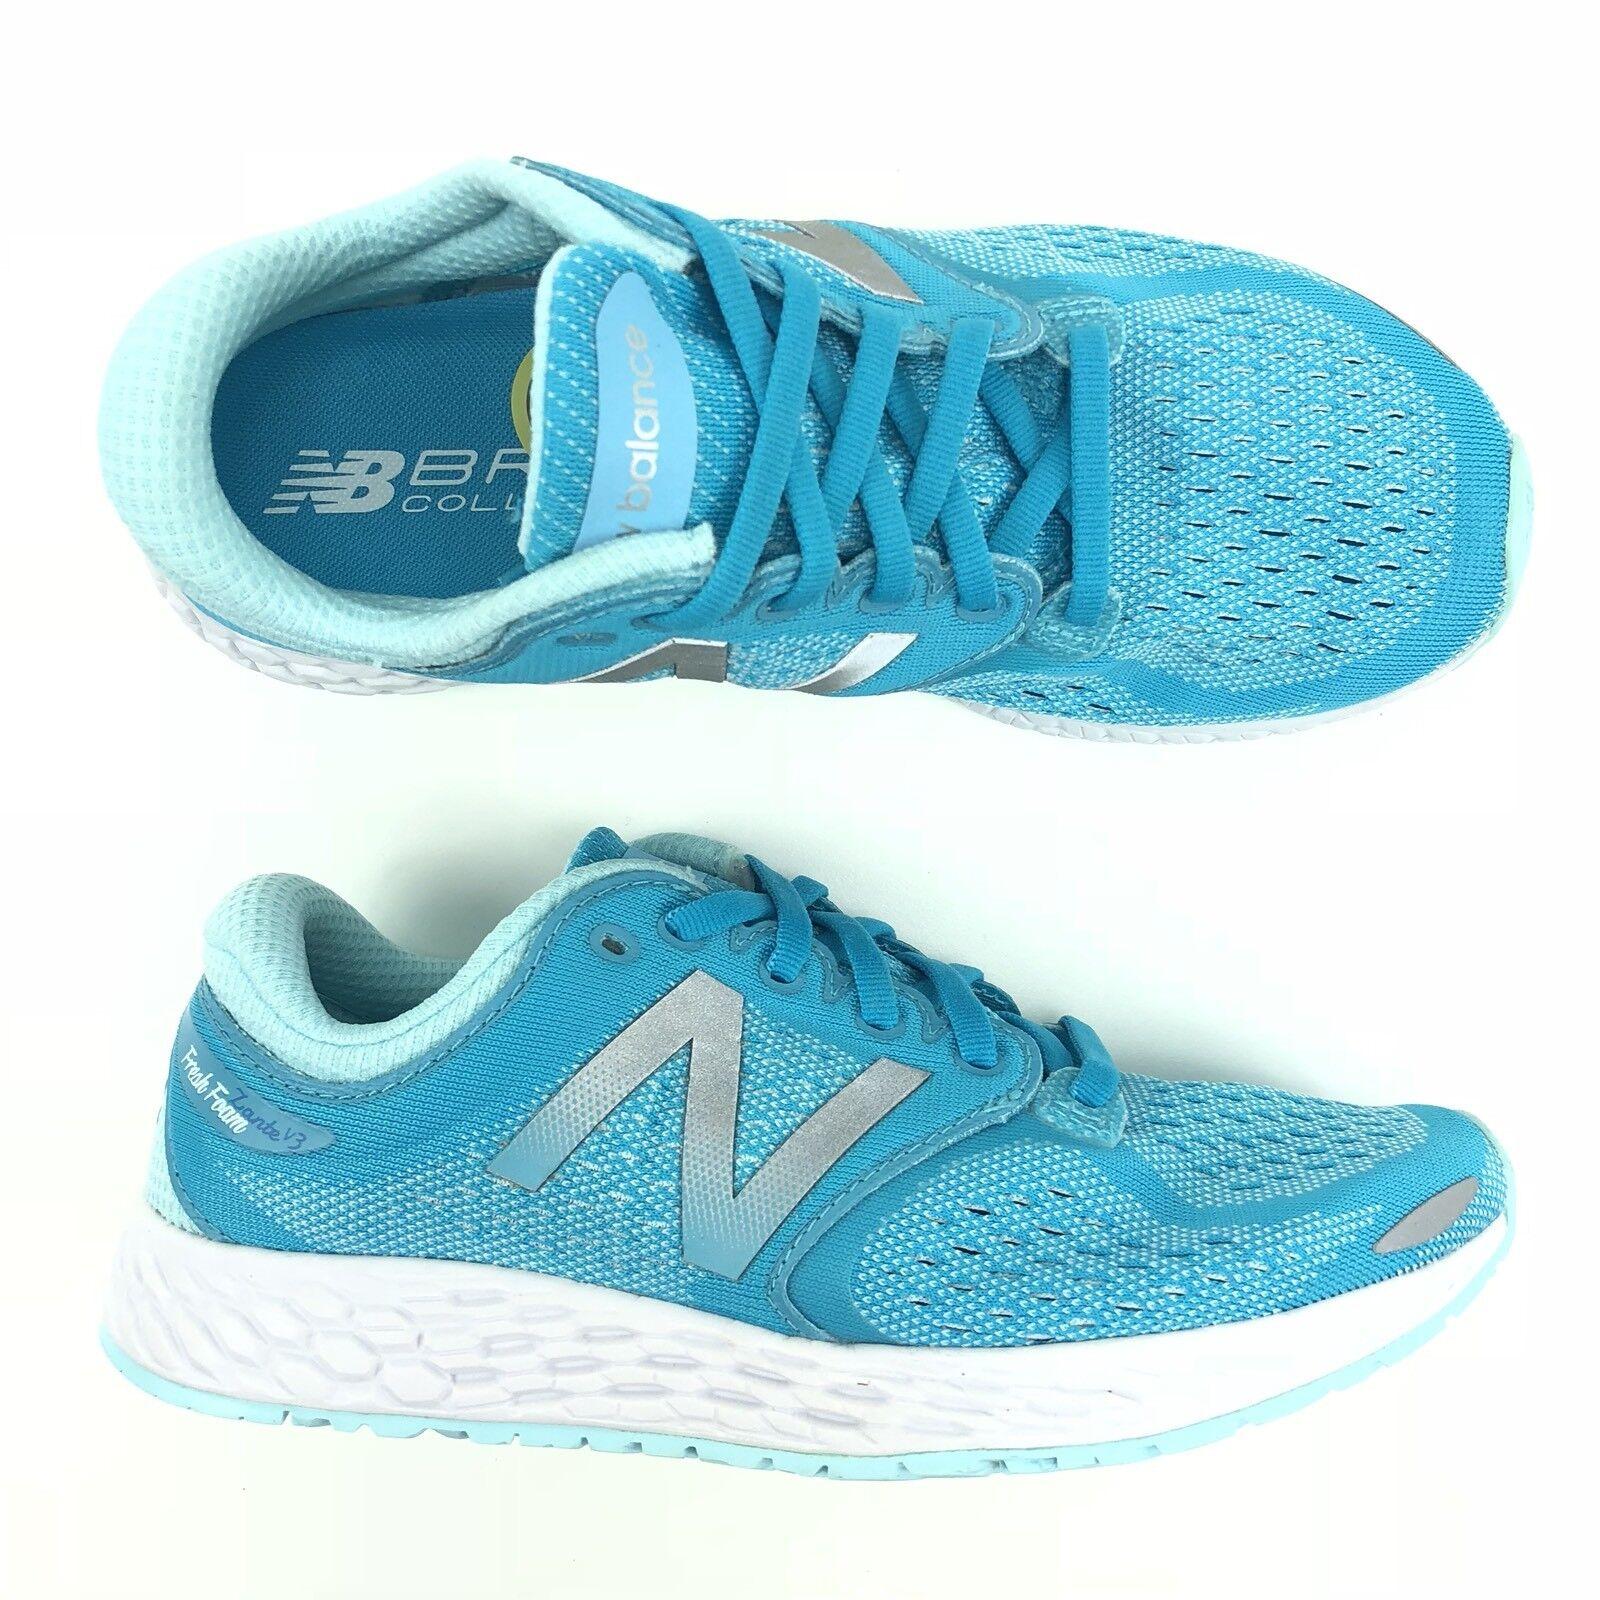 New Balance Fresh Foam Zante V3 V3 Zante Blau Damens Größe 5.5 Running Schuhe 687bf6